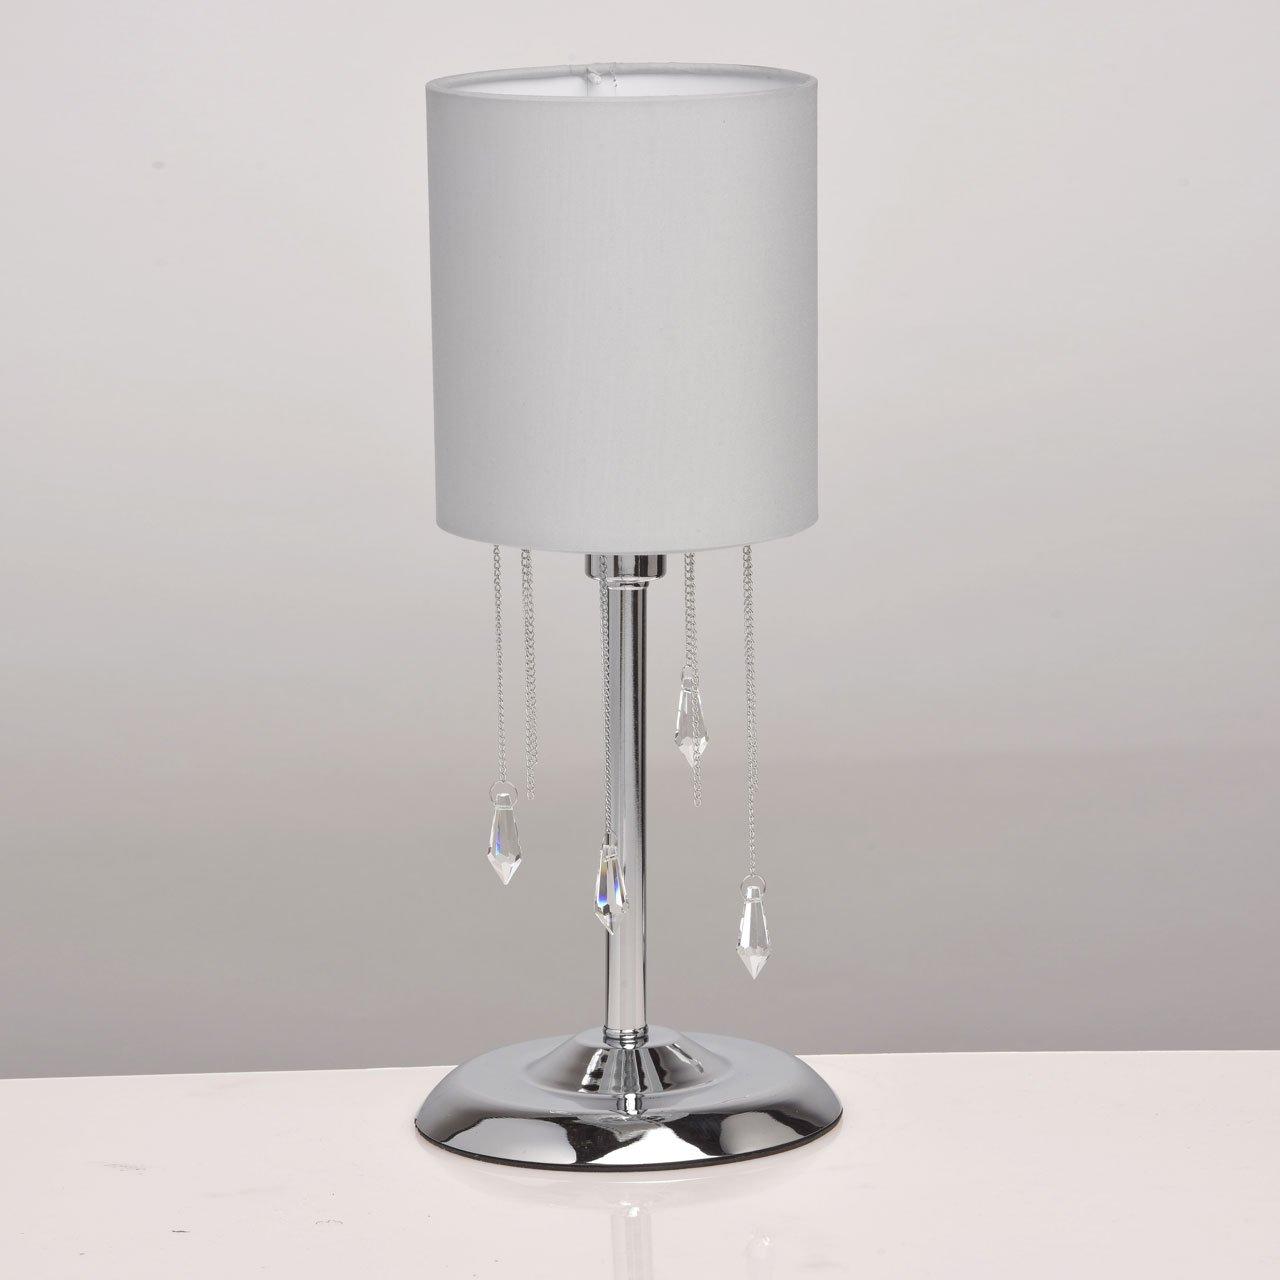 Stilvoller Kronleuchter 8 flammig Chrom Grau Stoffschirme [Energieklasse A] MW-Light